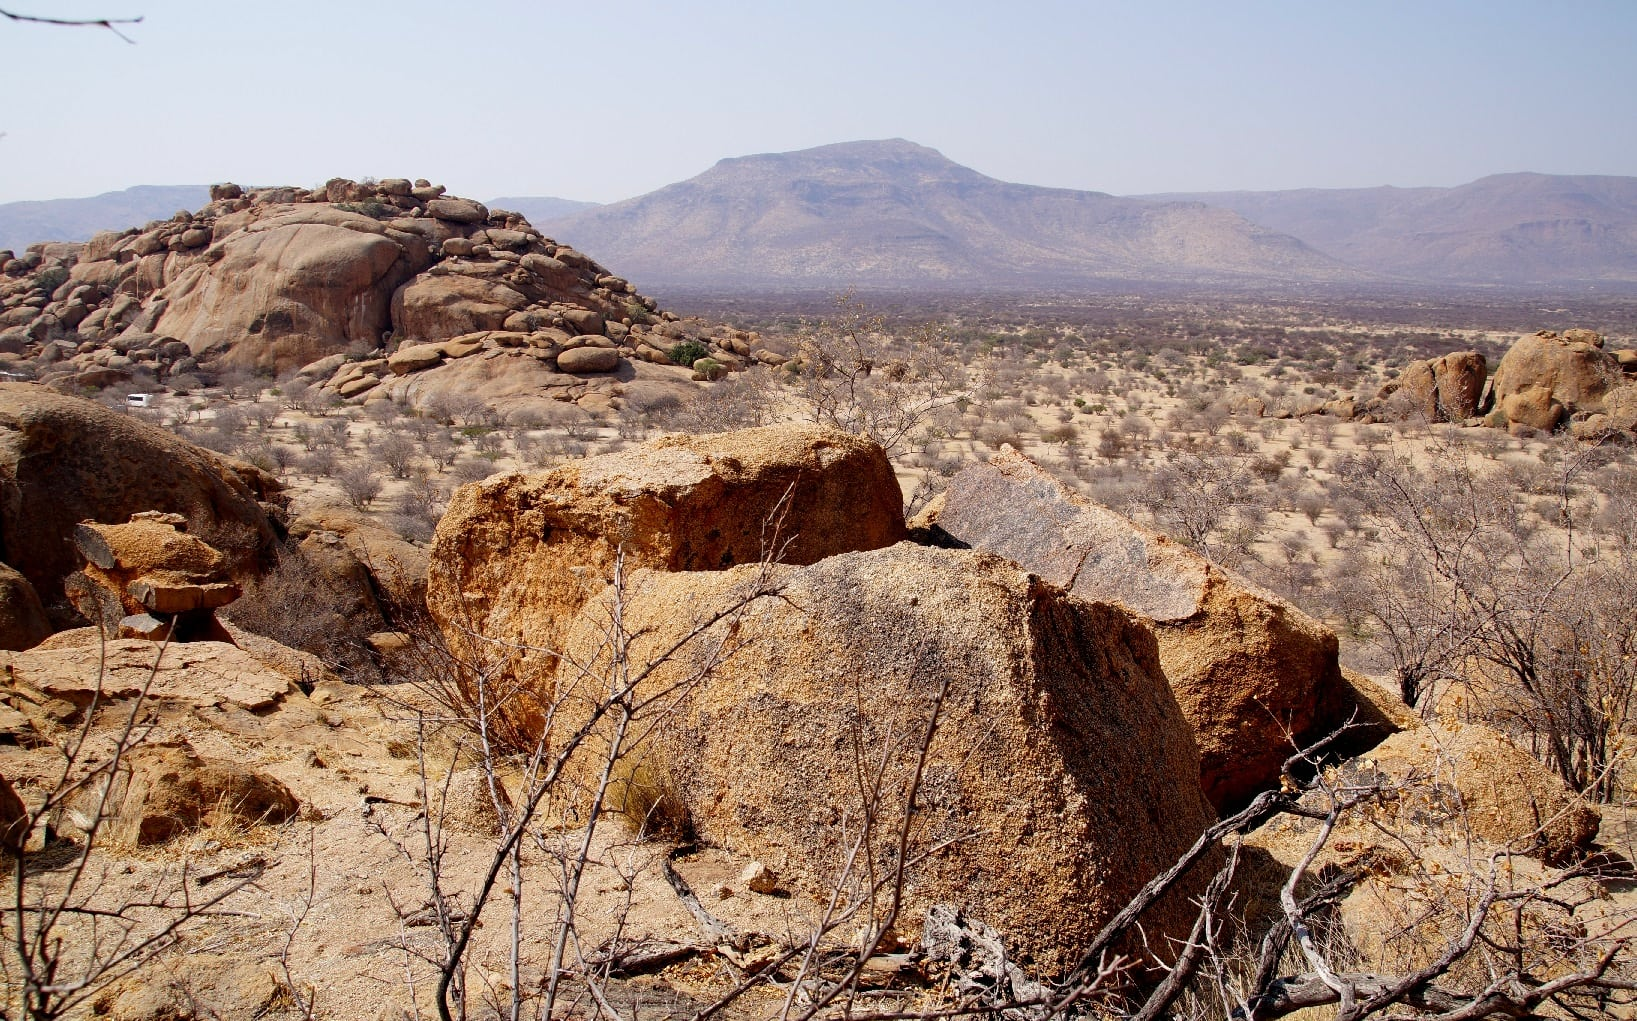 Das Erongogebirge in Namibia